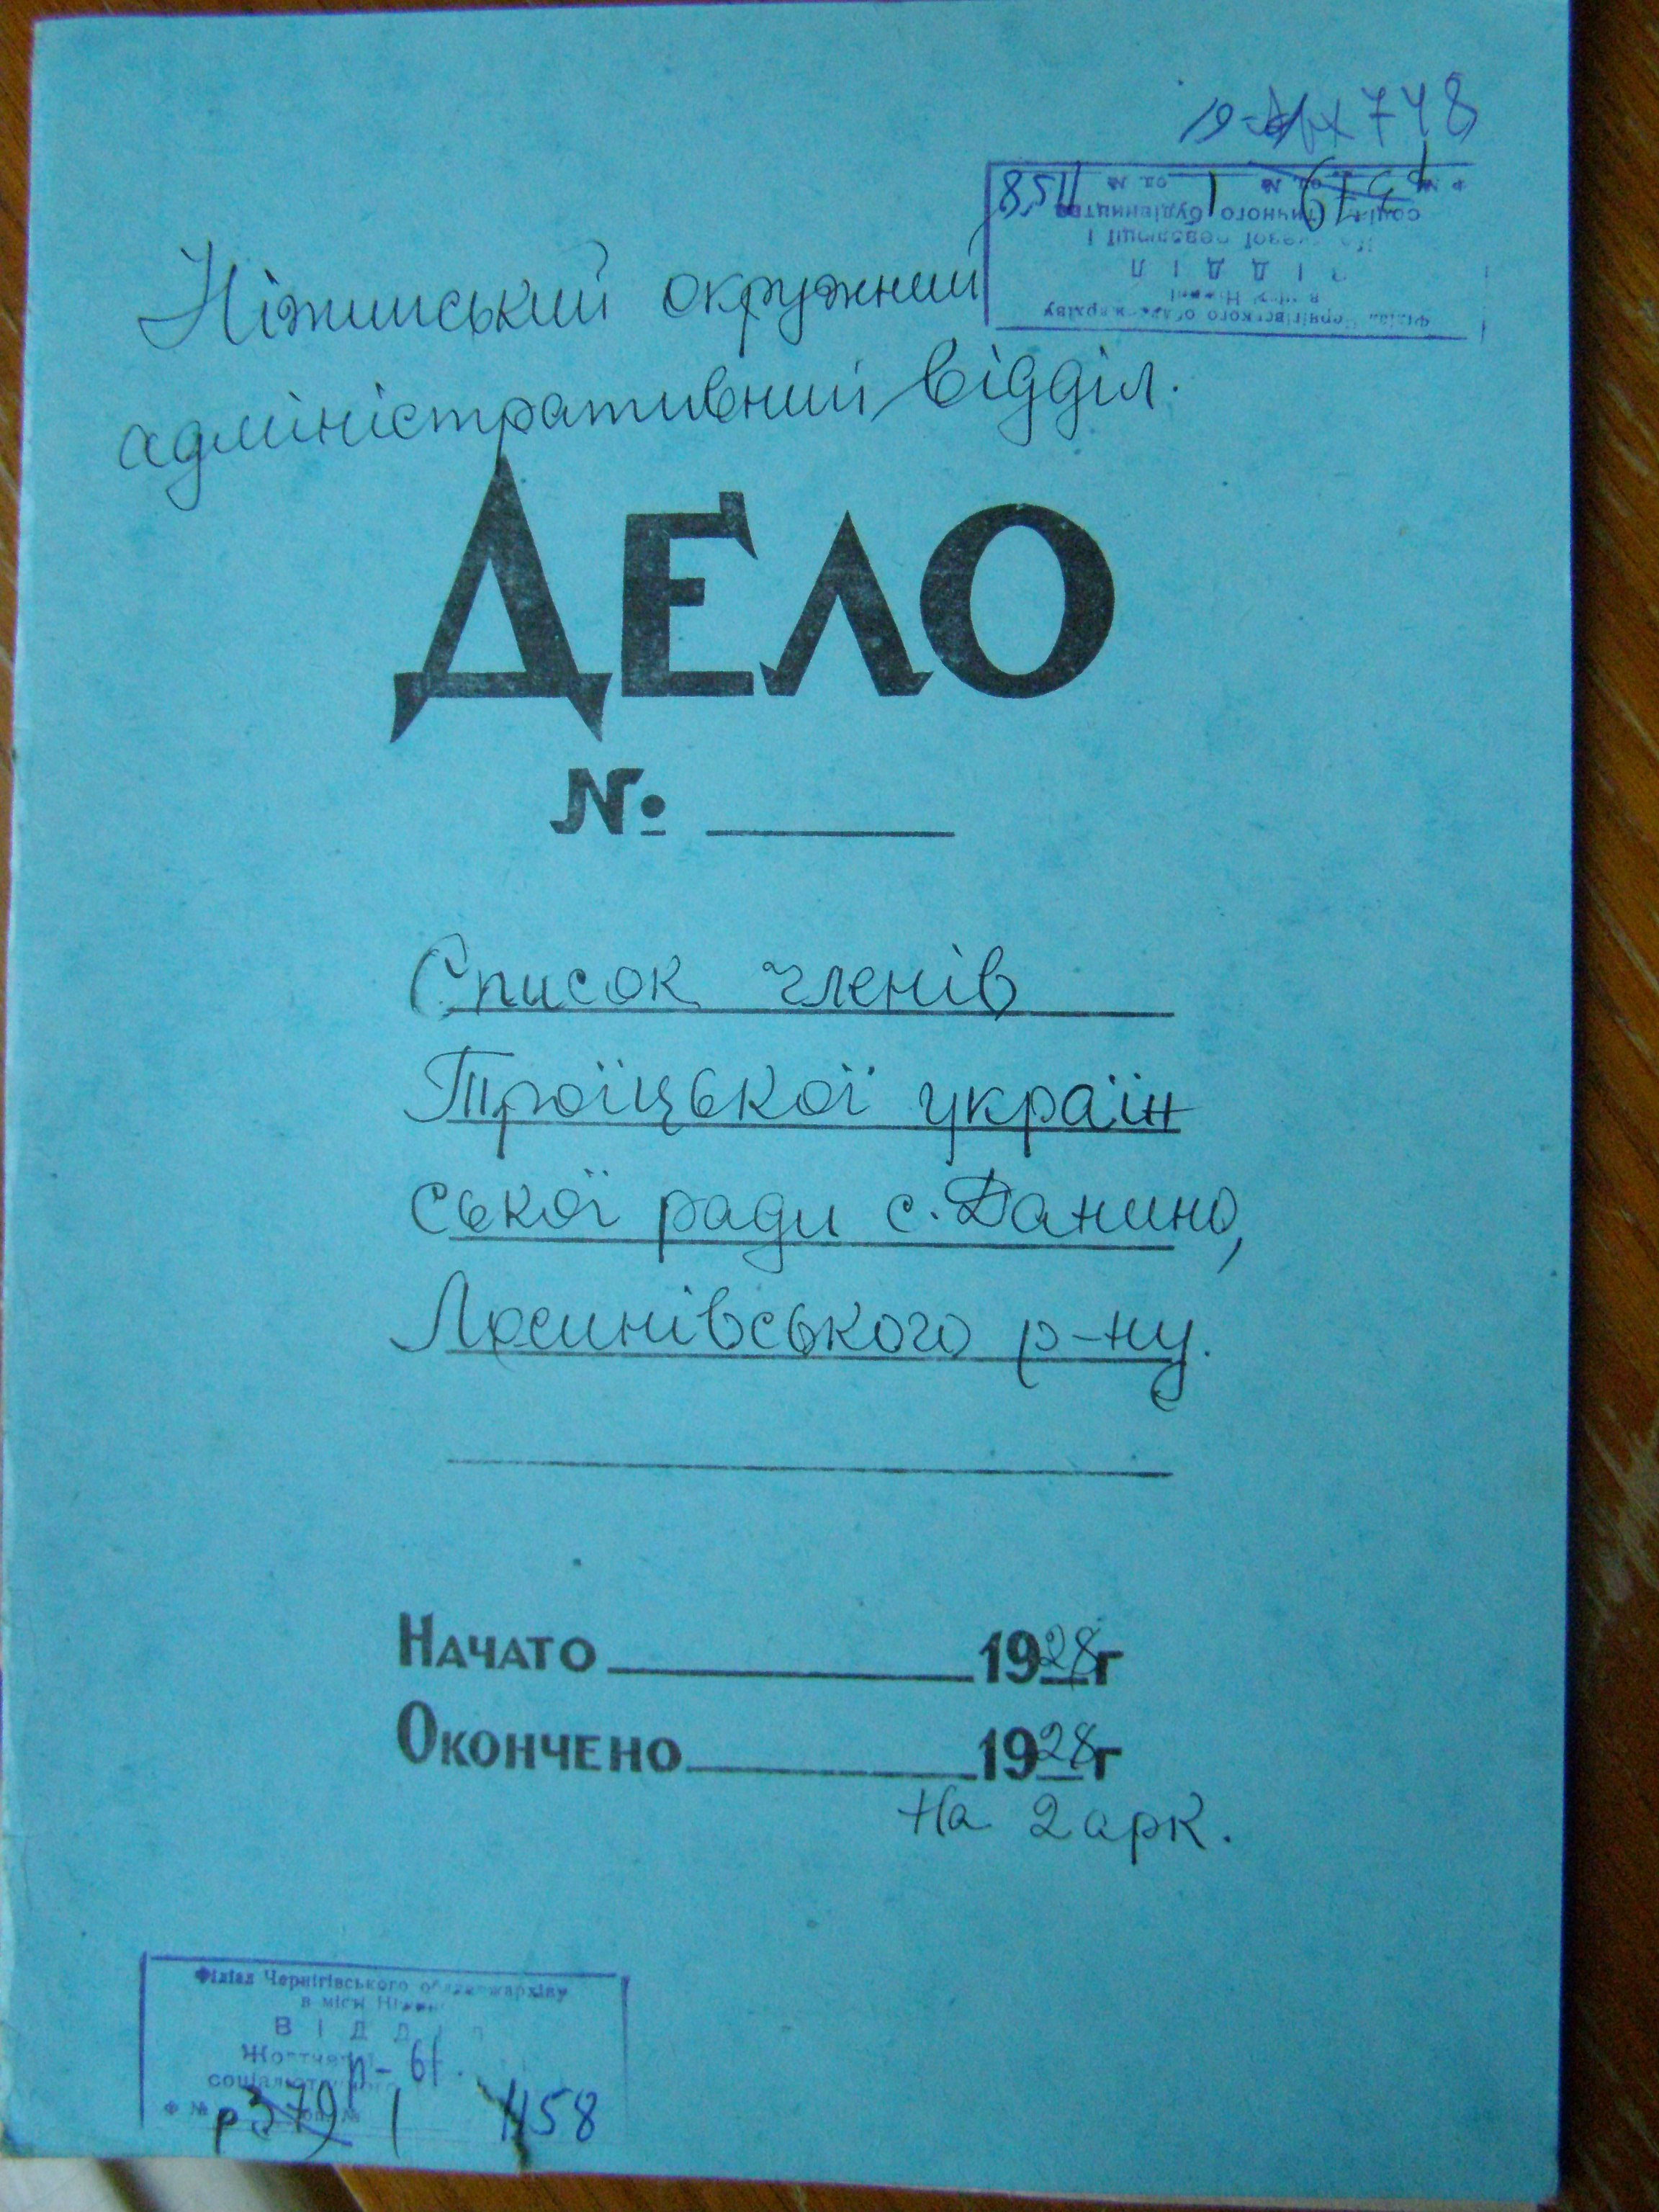 Микола Тимошик, Різдво, Великдень, куркулі, радянська влада, газети